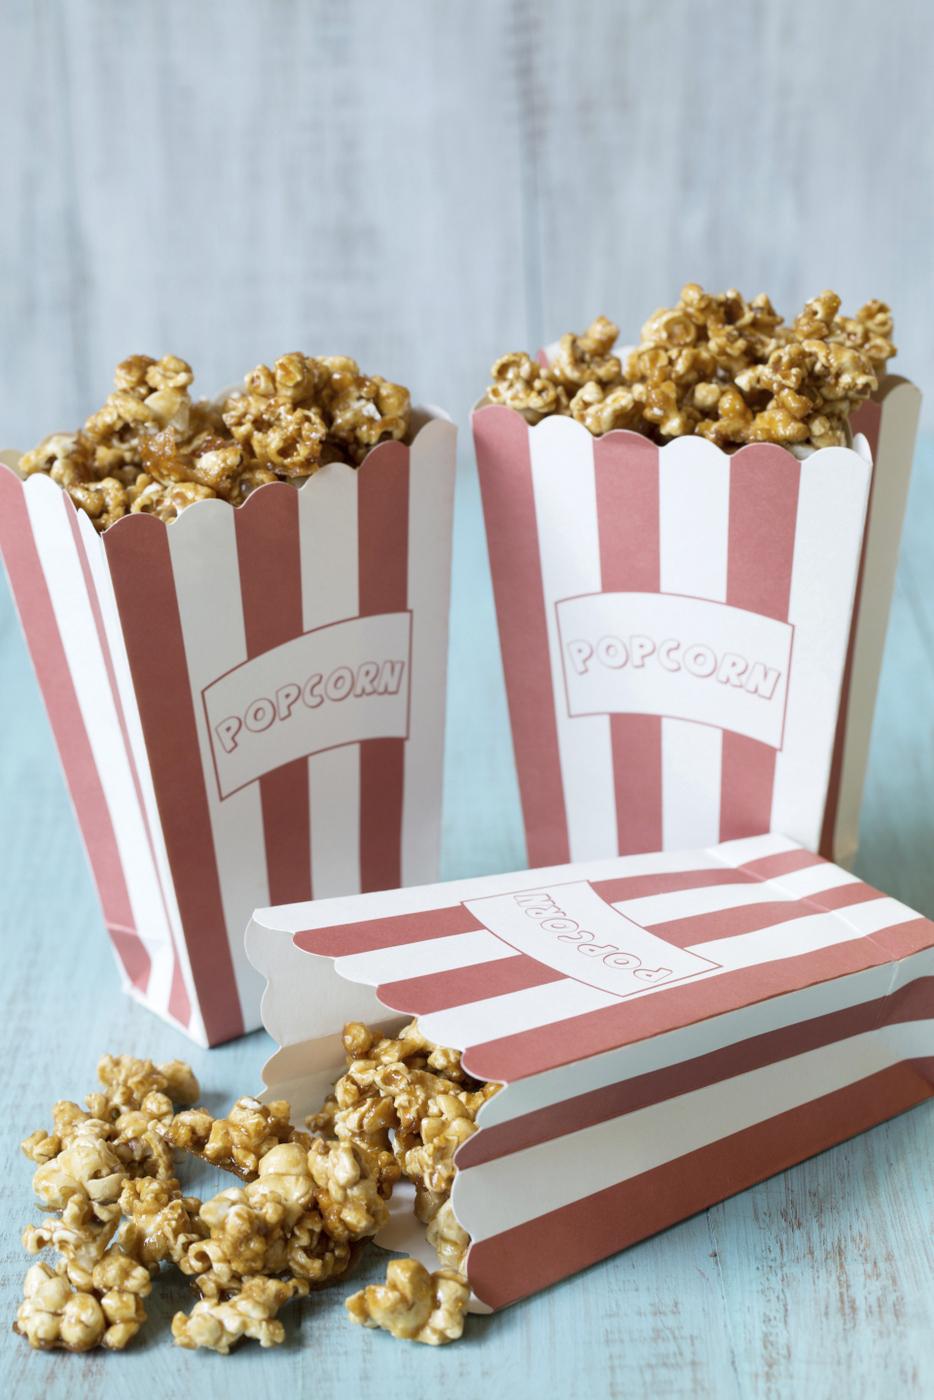 Caramel Popcorn Recipe (refined sugar free)